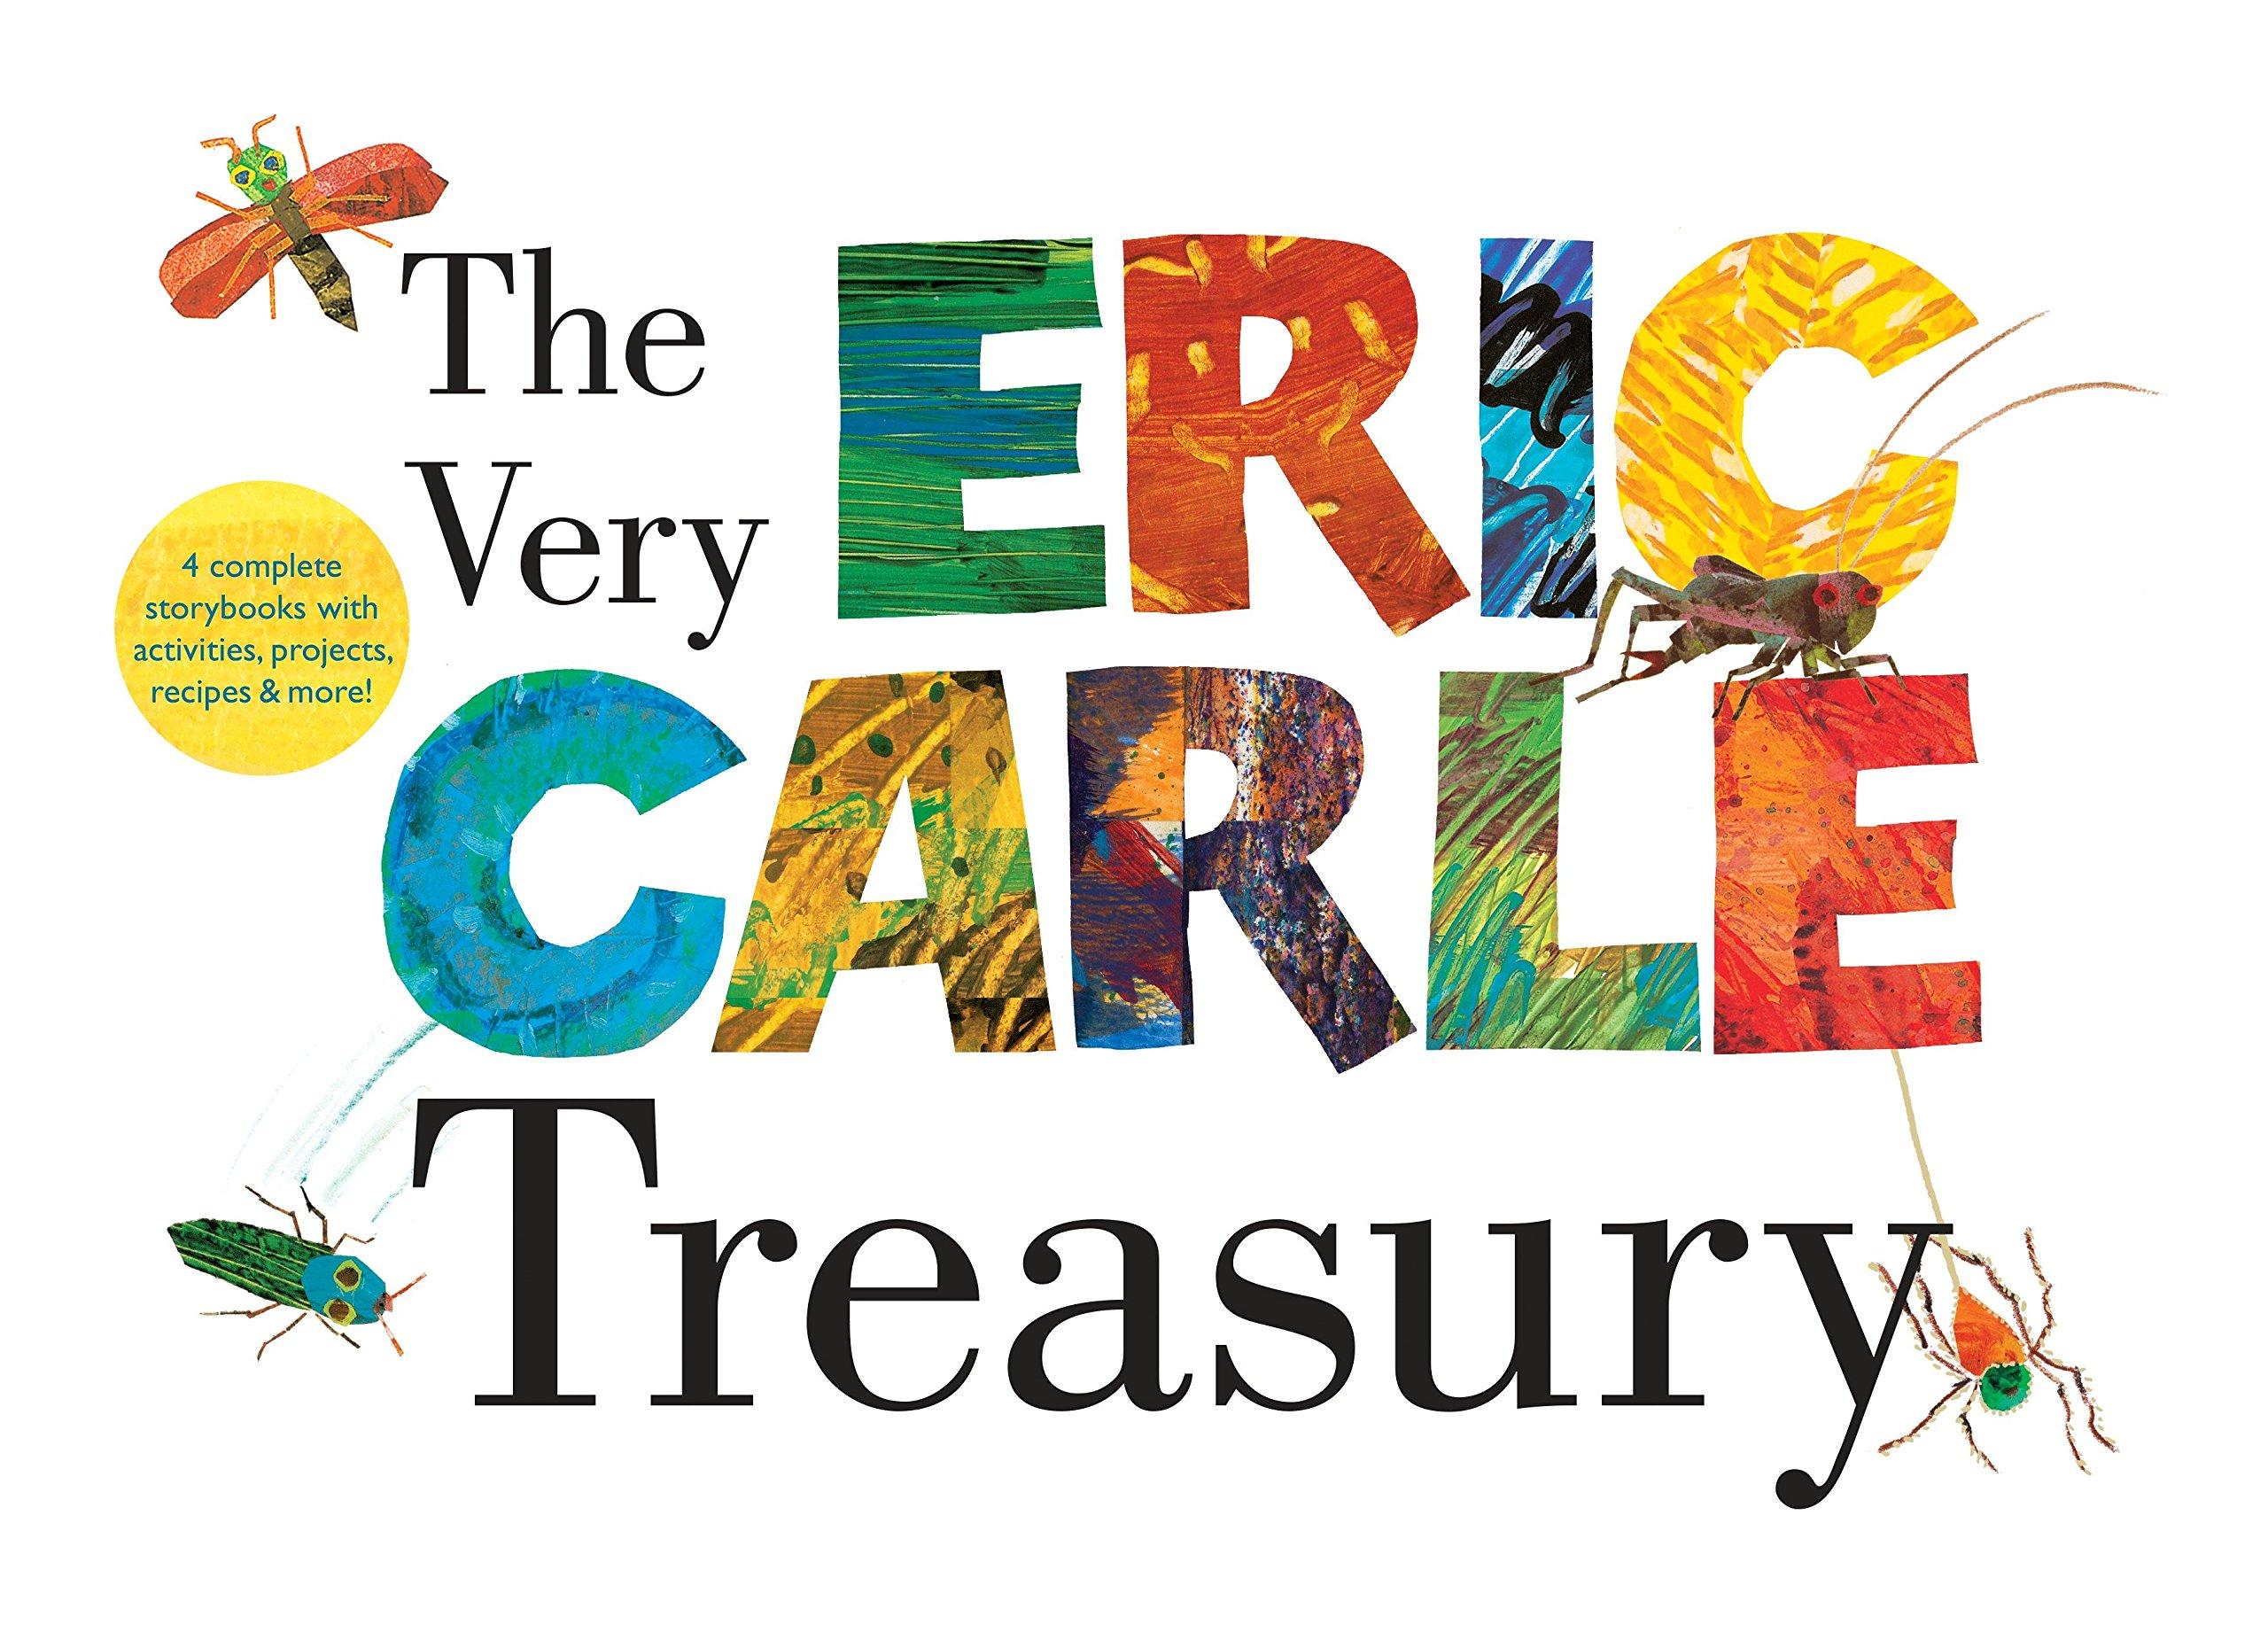 The Very Eric Carle Treasury: 80¢